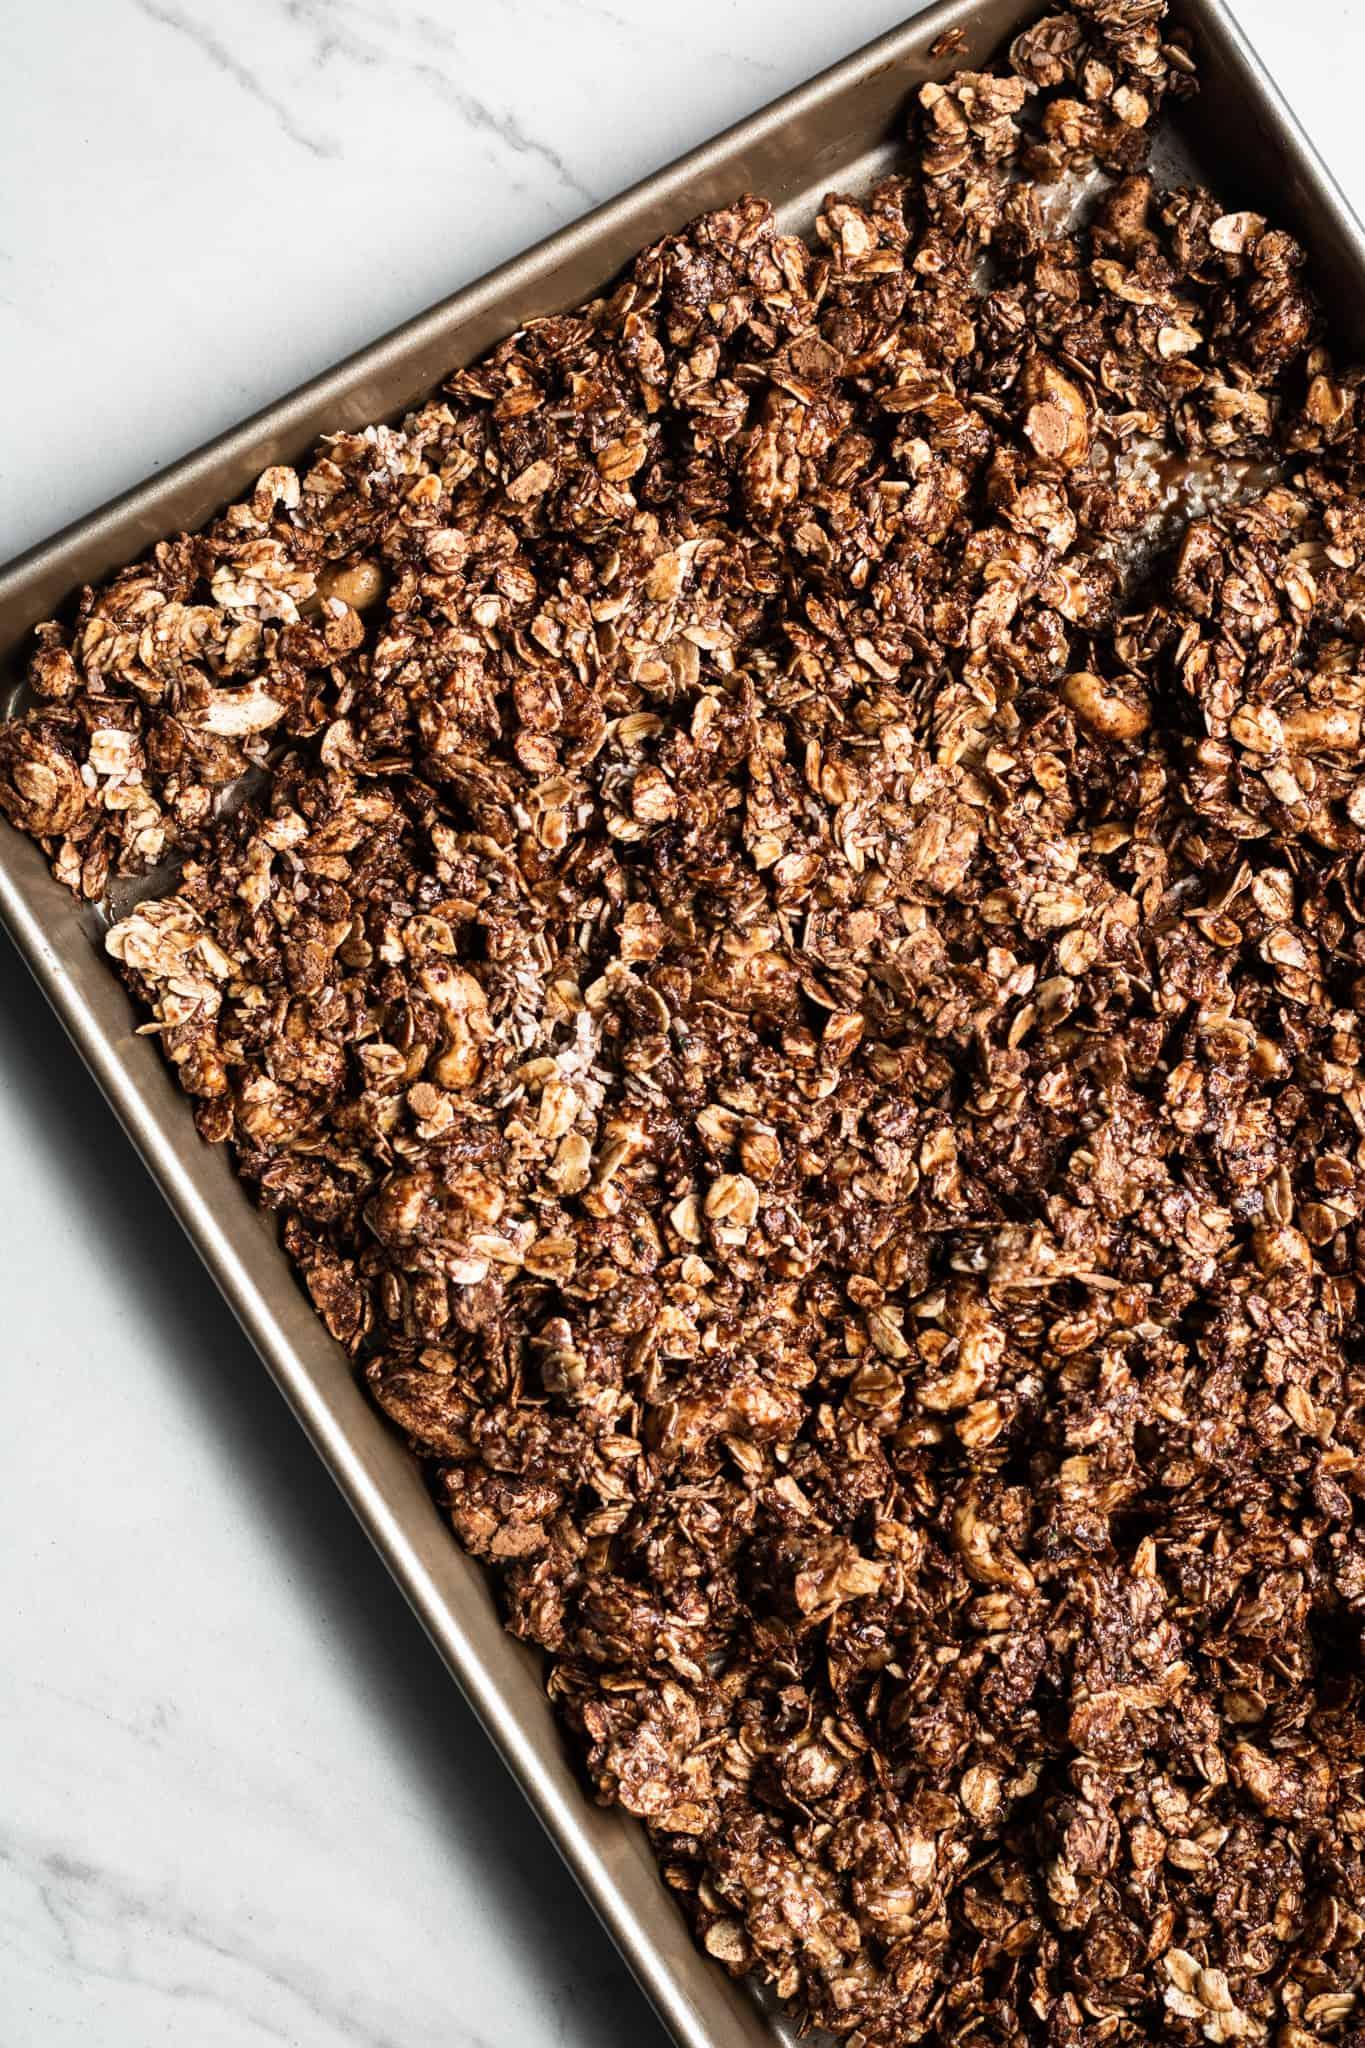 granola mixture unbaked on a baking sheet